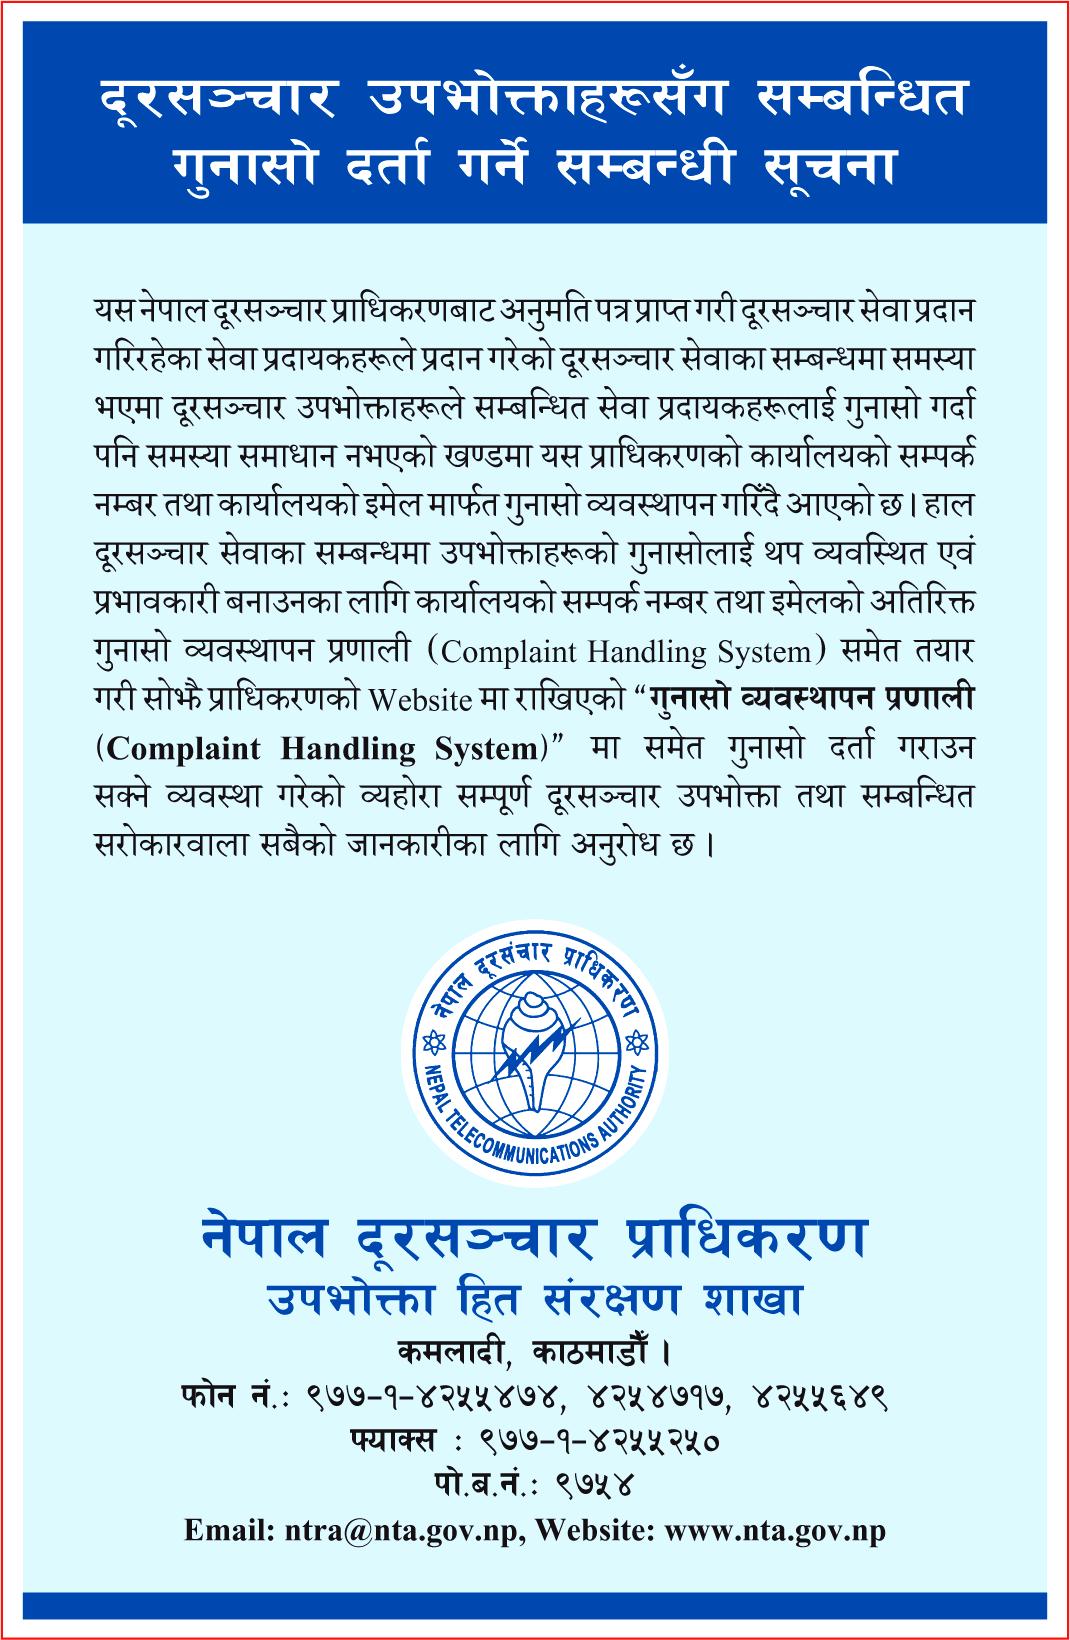 Nepal Doorsanchar